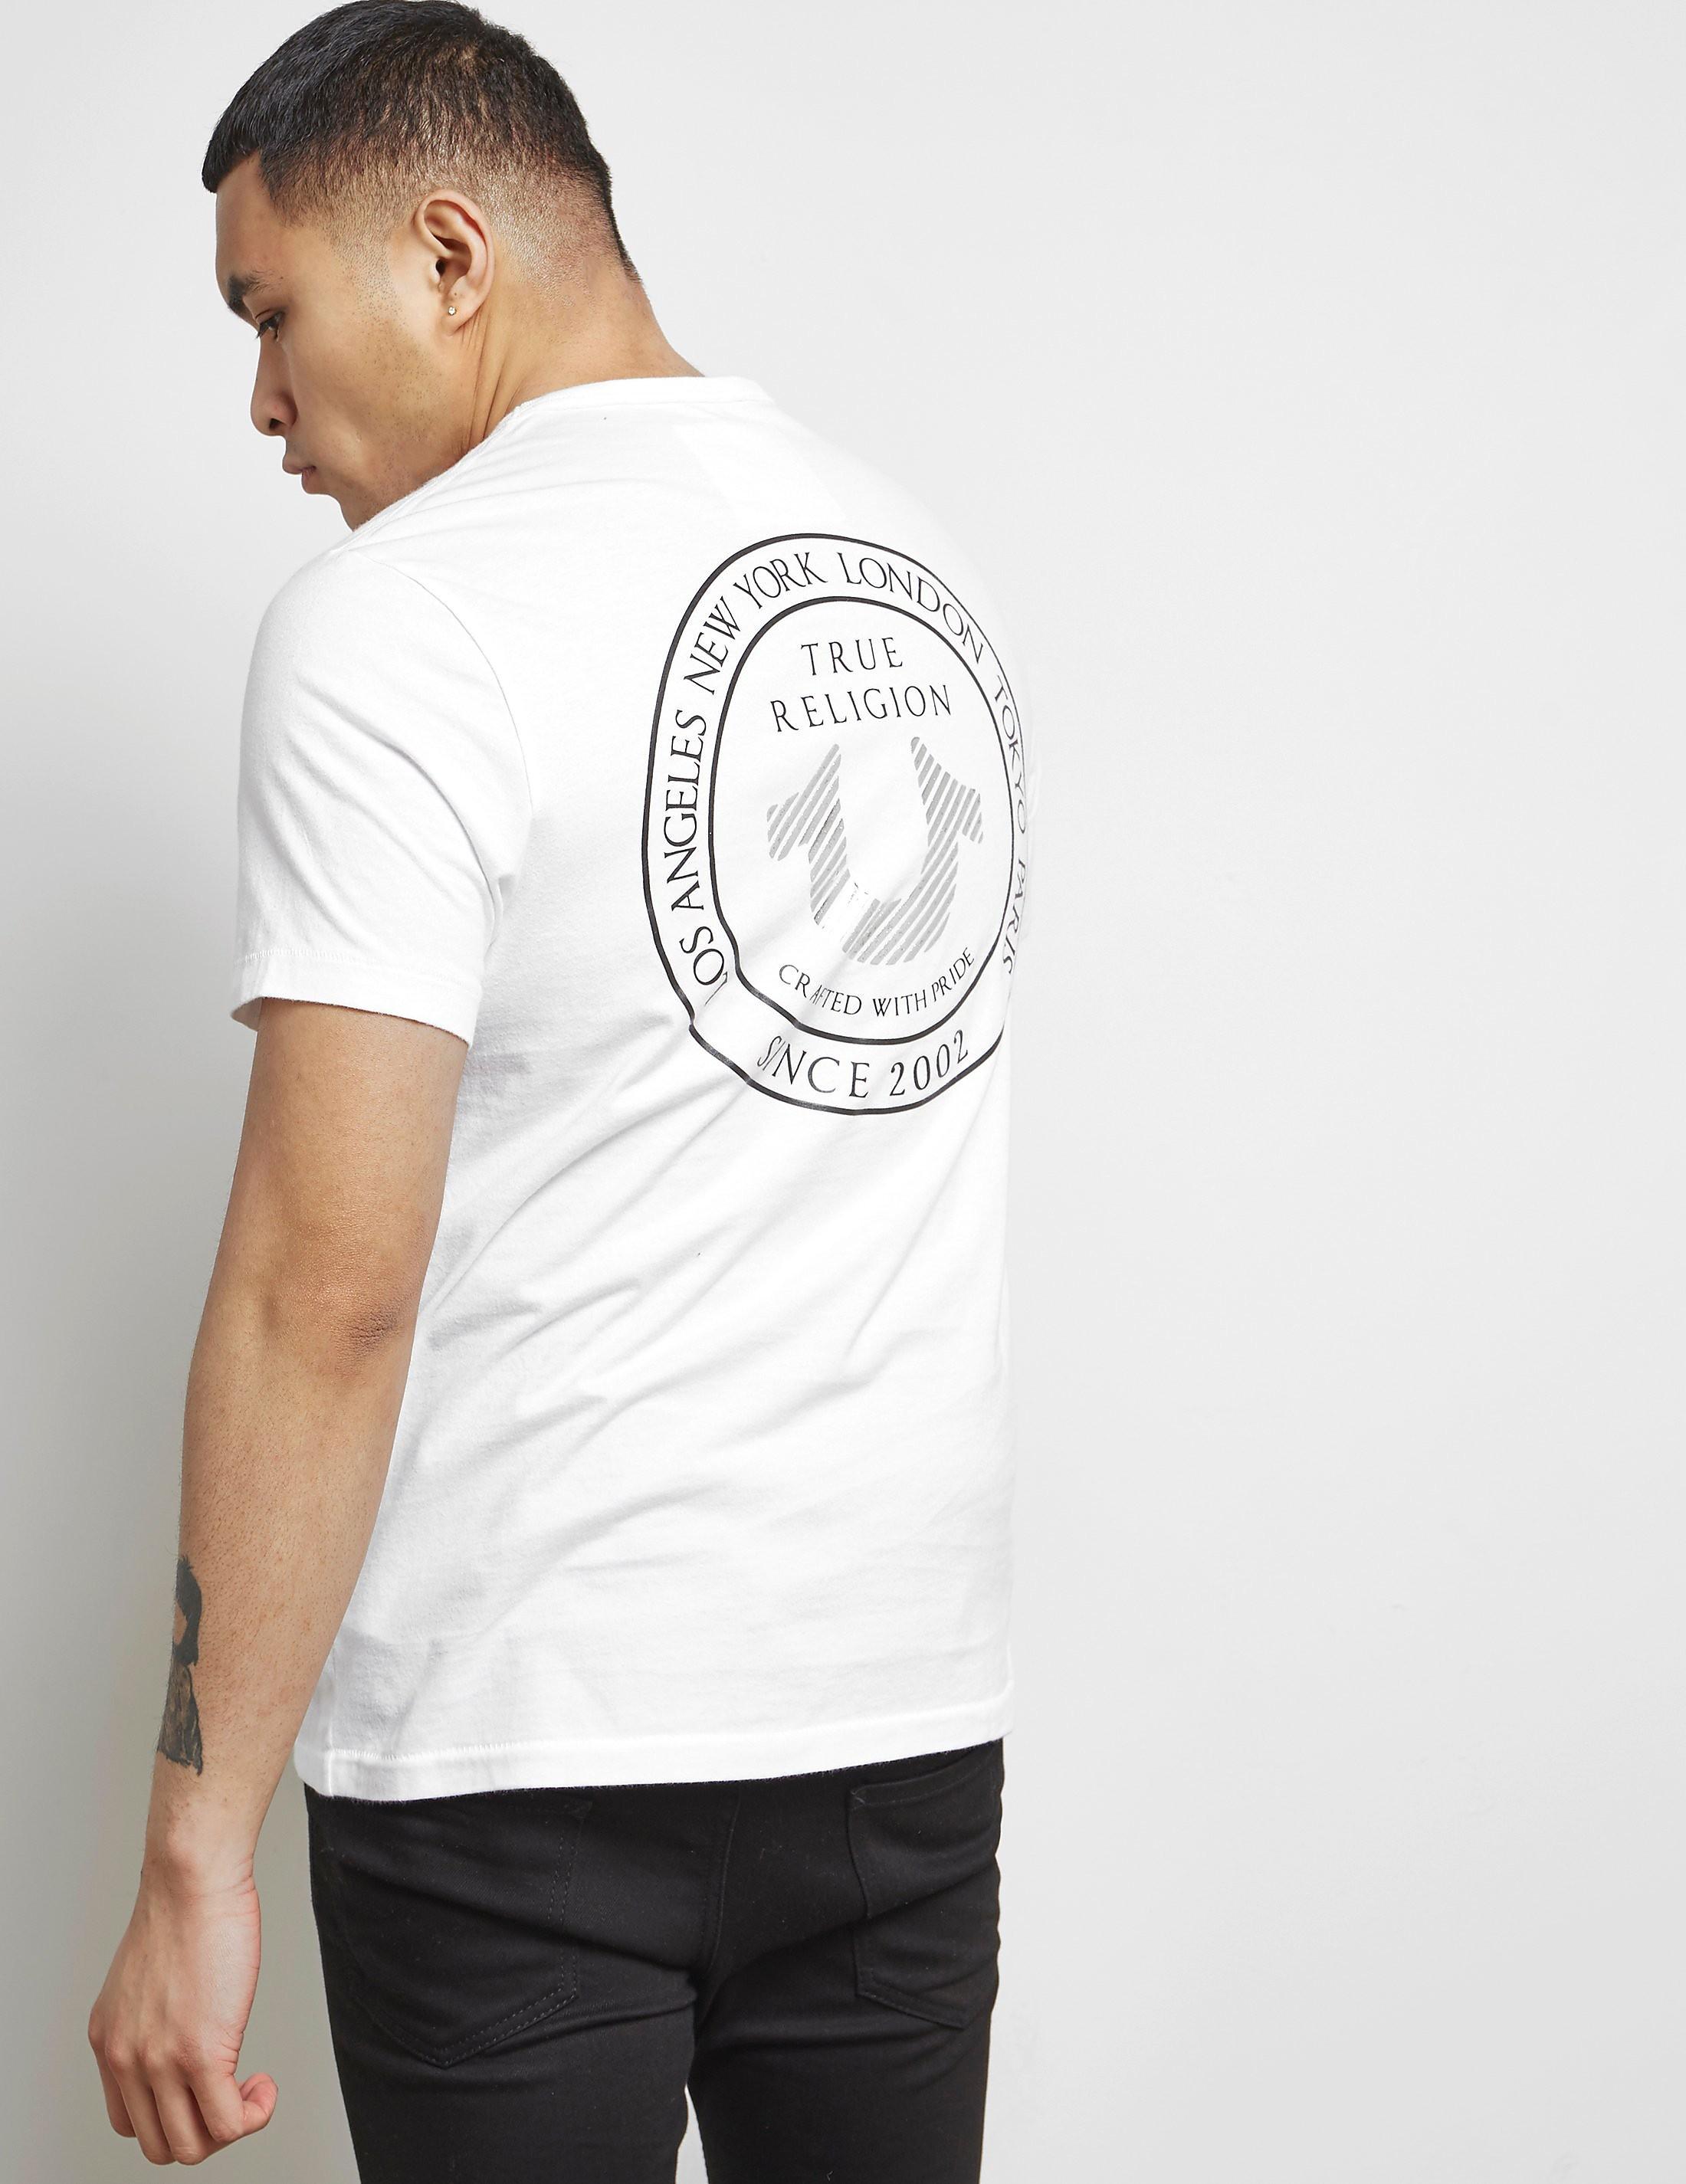 True Religion Back Badge Short Sleeve T-Shirt